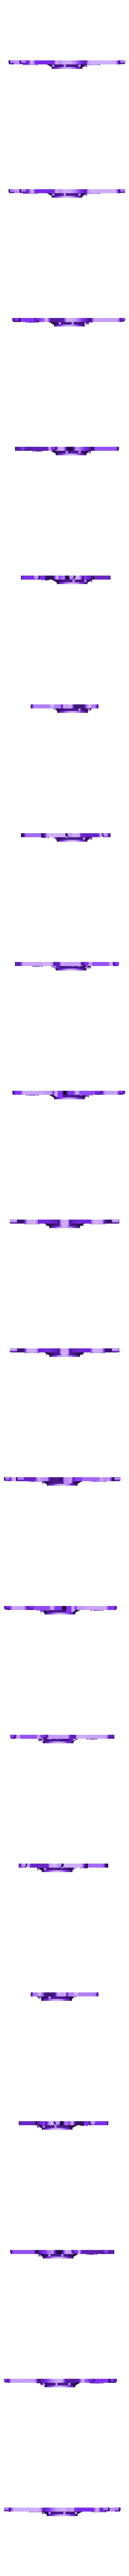 front.stl Download STL file Cyberpunk themed goggles • 3D printer design, gobotoru